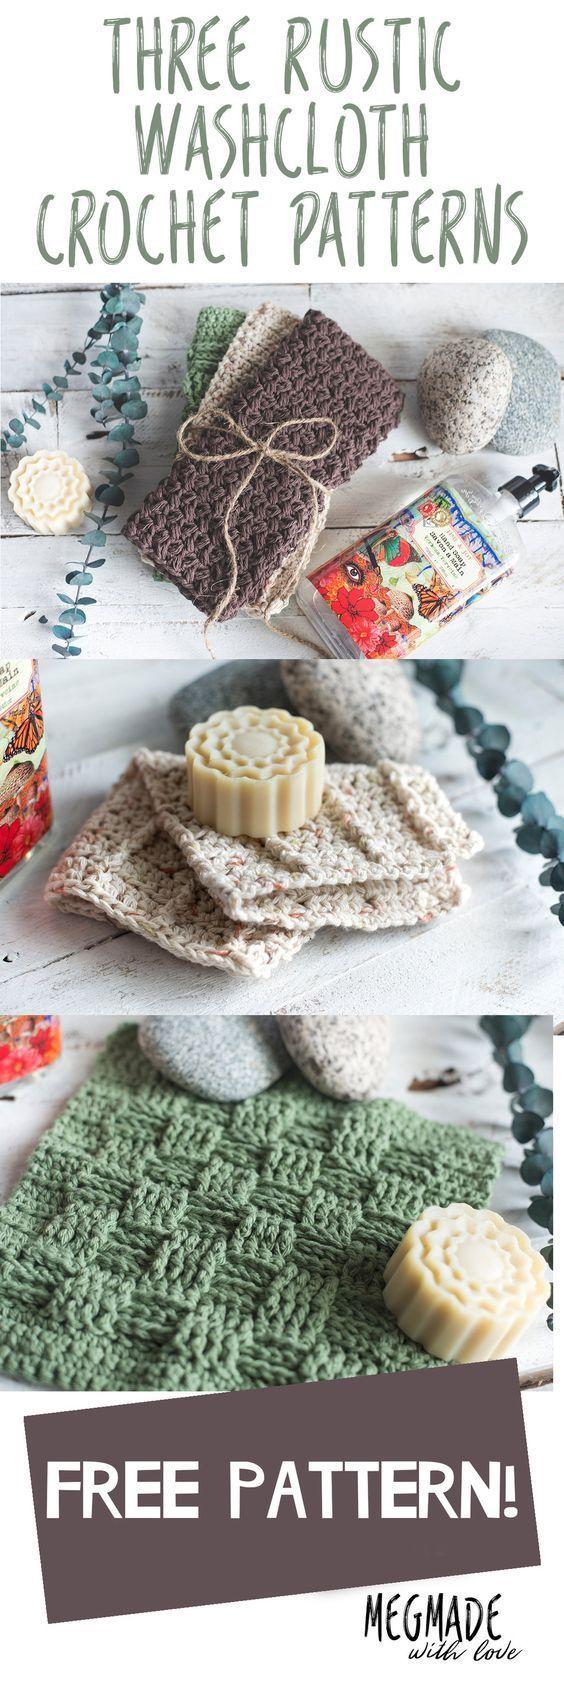 Three Rustic Washcloth Patterns | Häkeln